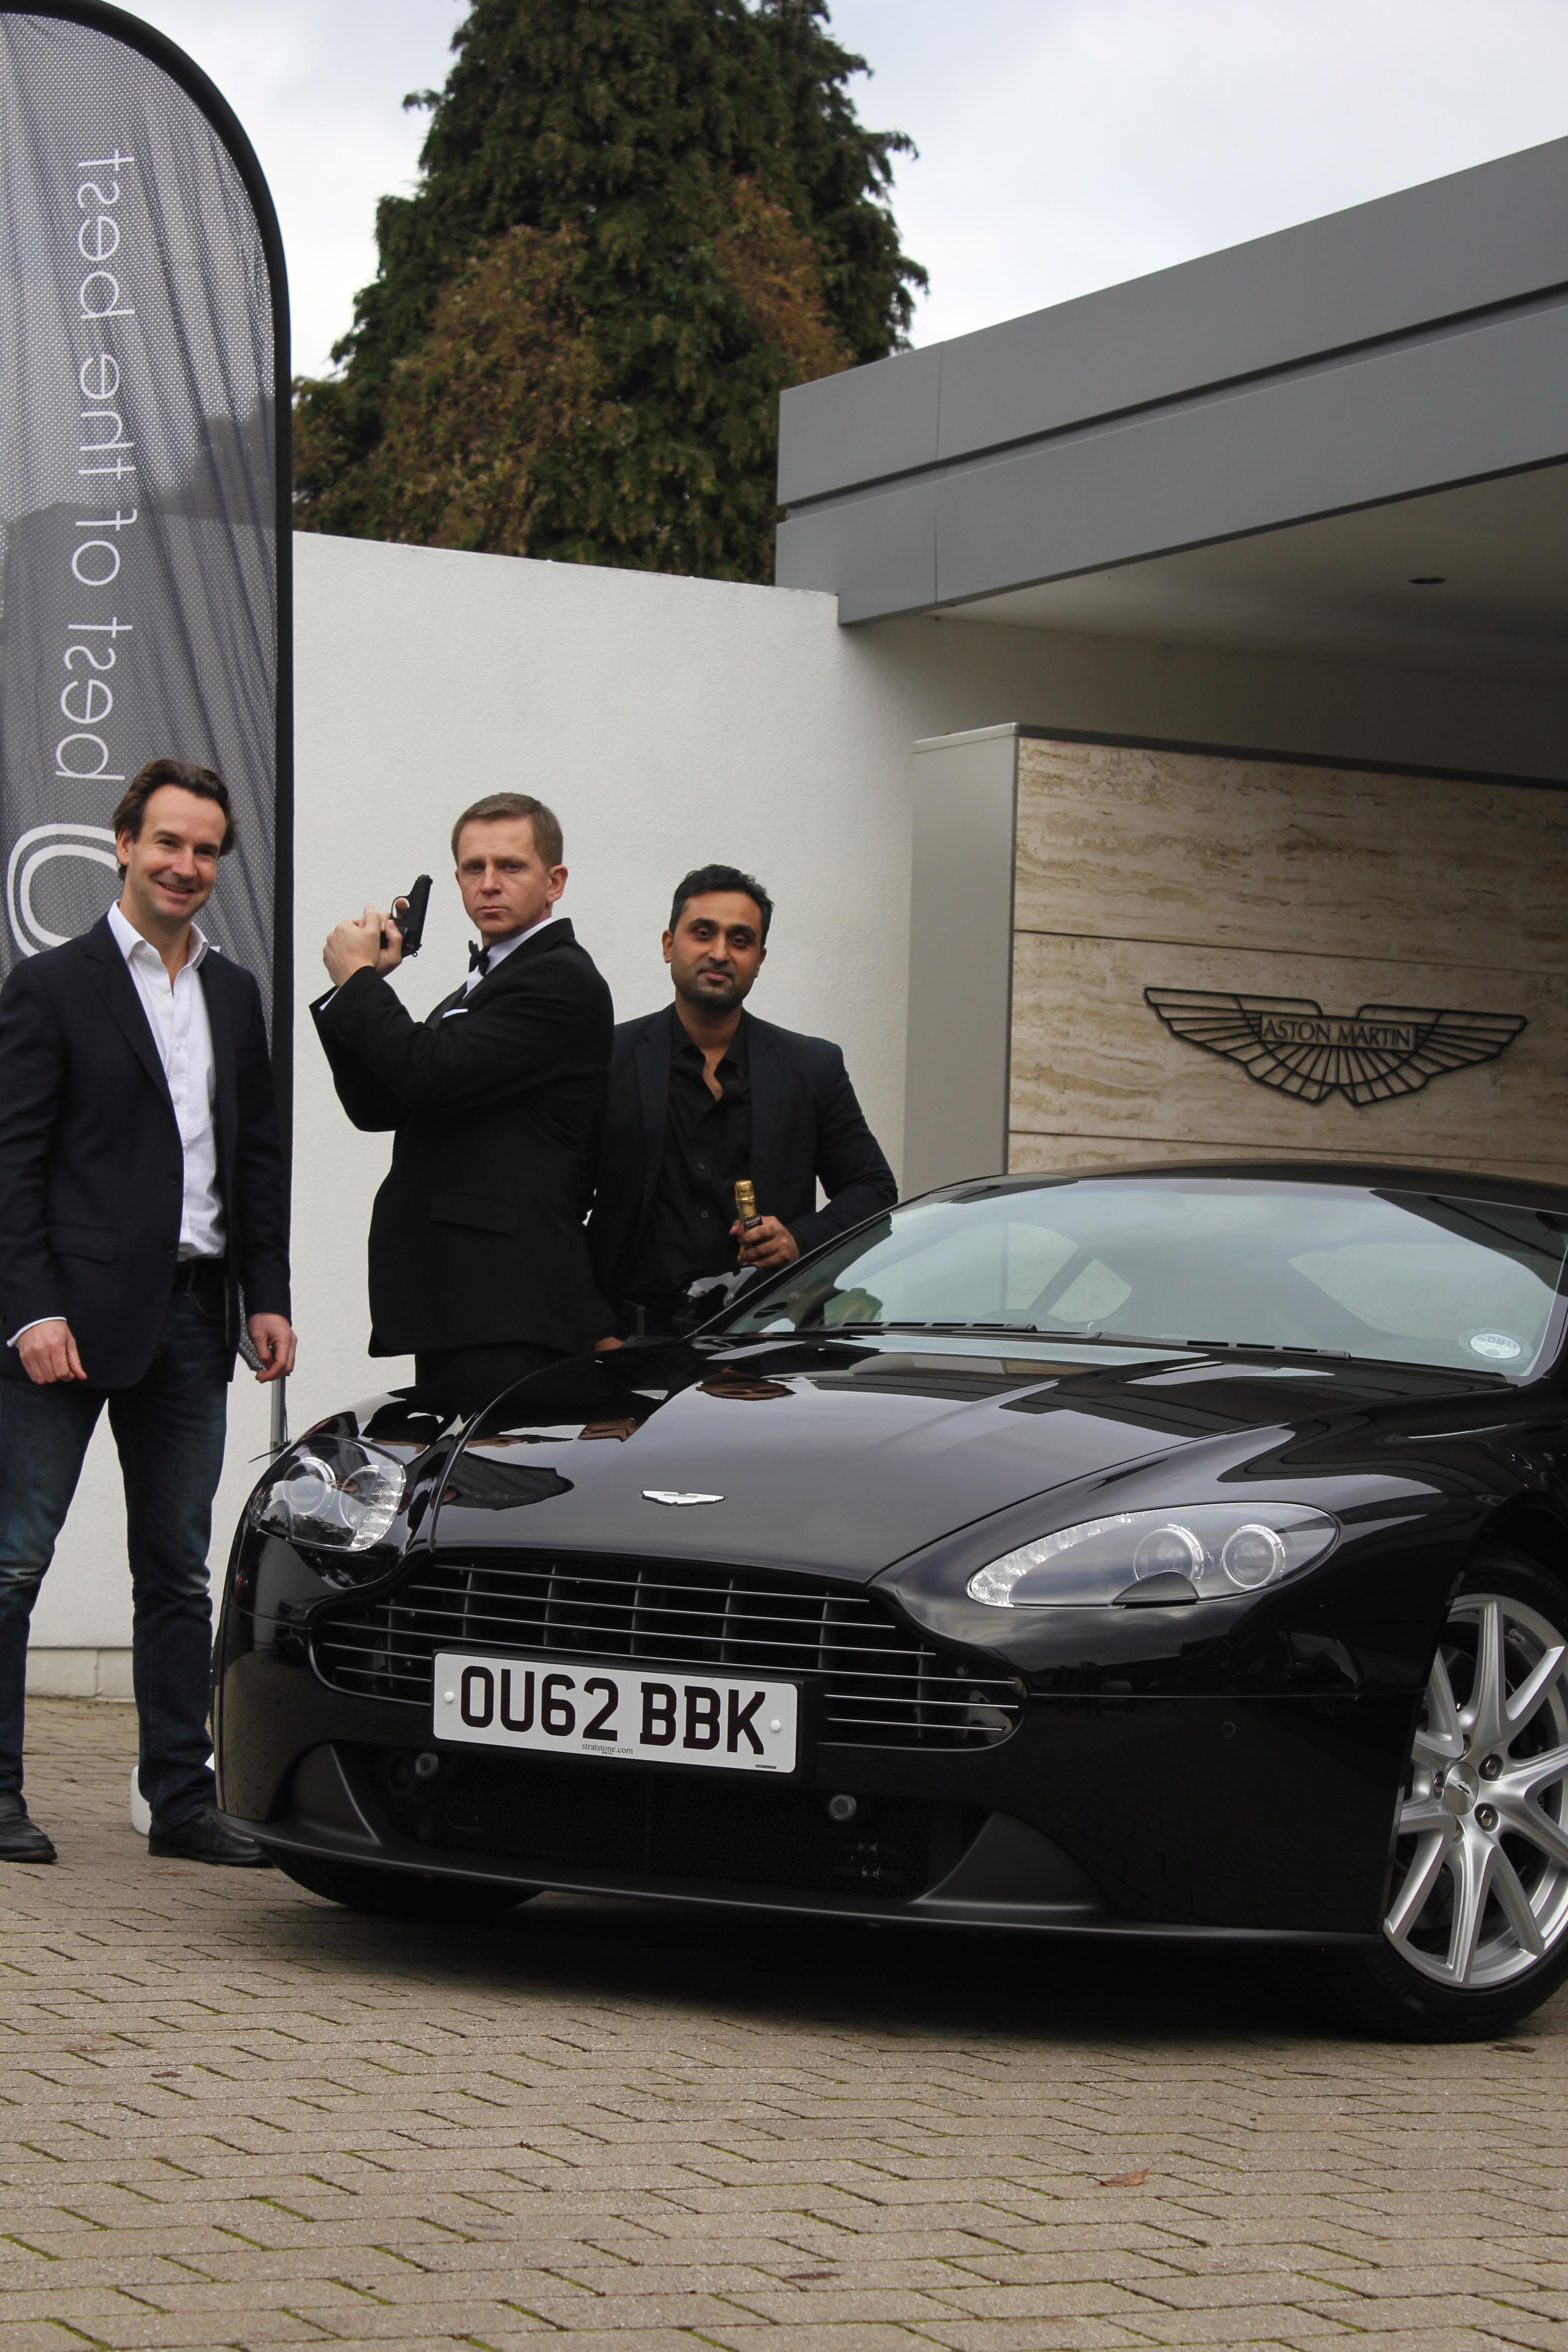 Skyfall: 007 Bond car winner is shaken and stirred - Car ...